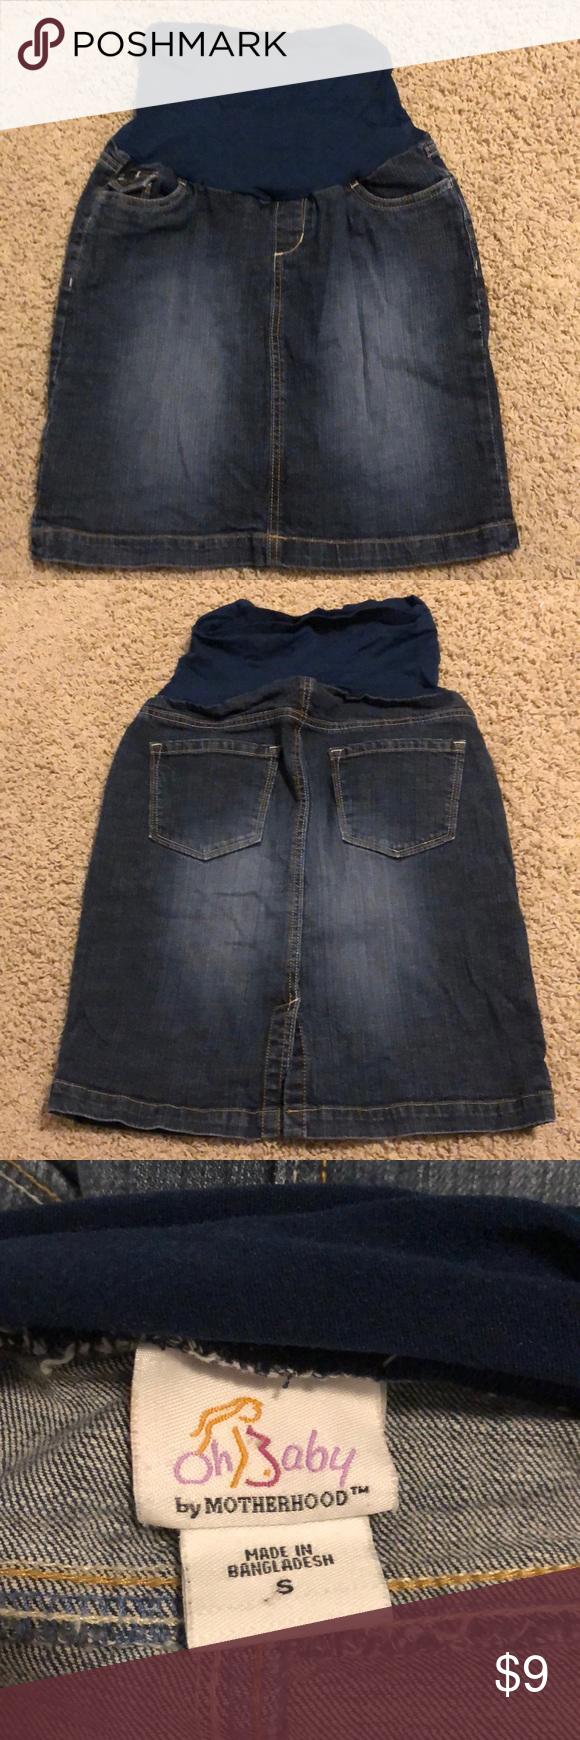 603185653 Maternity Denim Skirt Maternity skirt, worn a few times Oh Baby by Motherhood  Skirts Midi